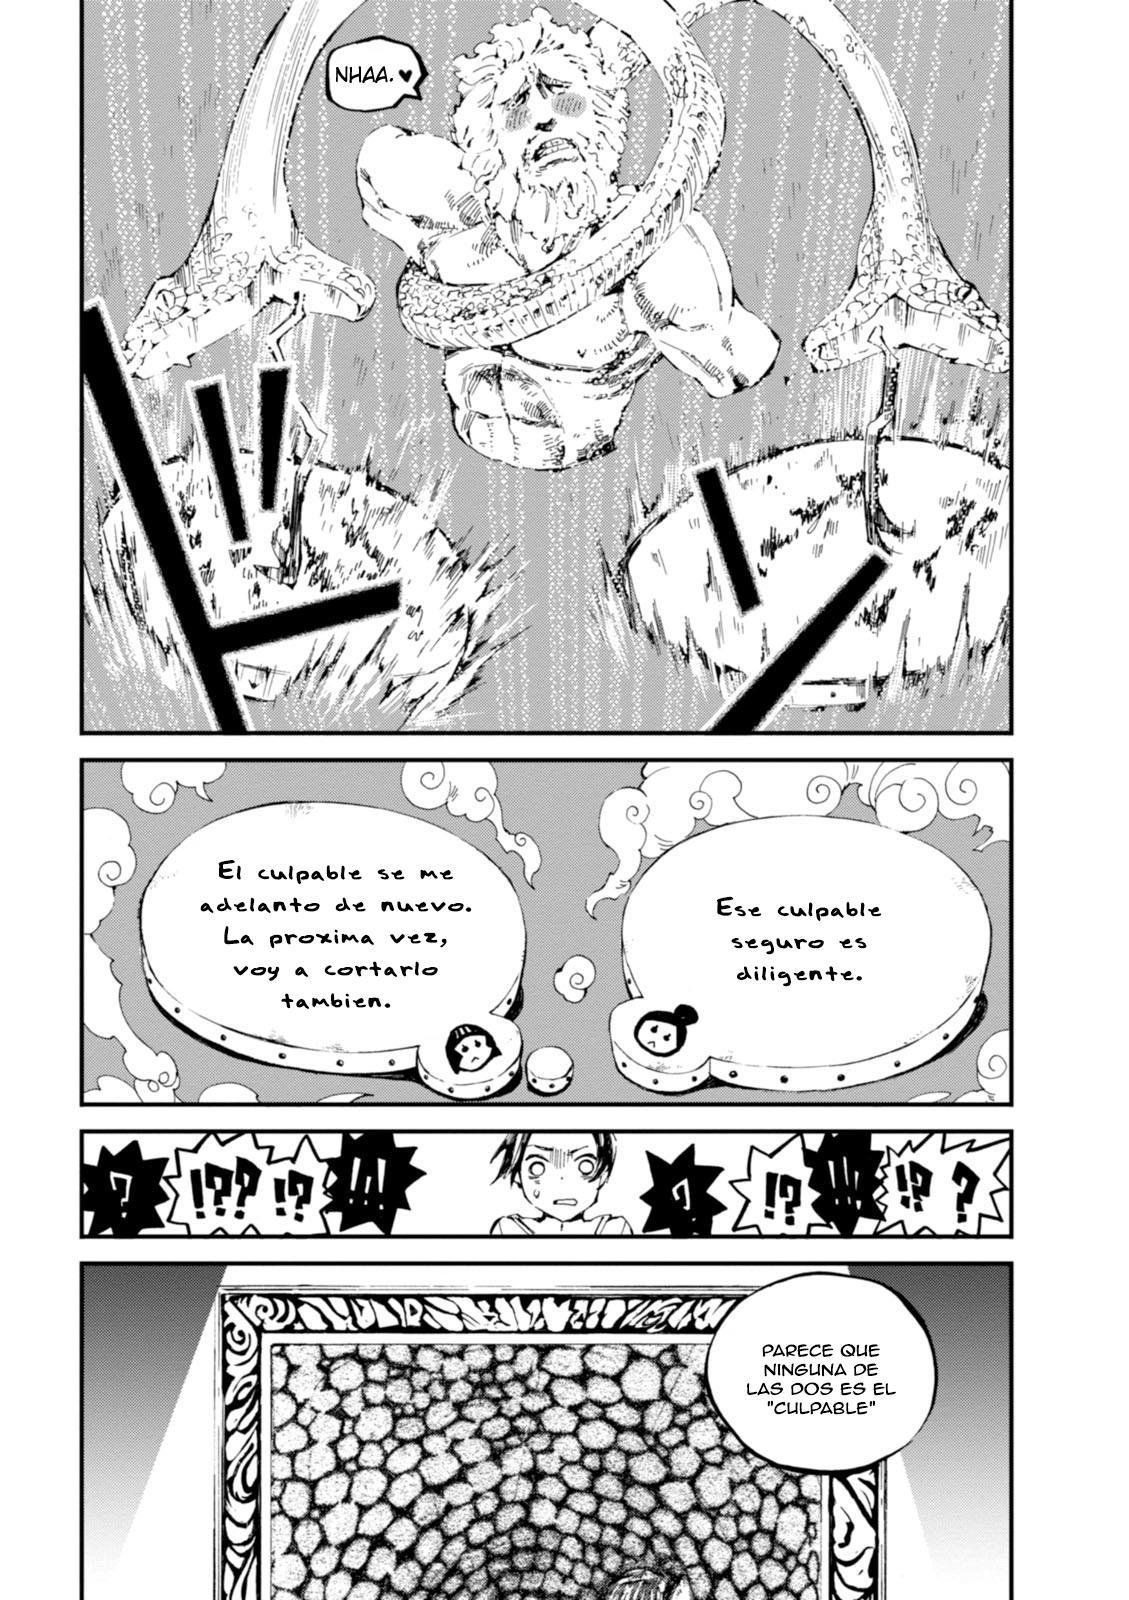 http://c5.ninemanga.com/es_manga/27/17755/453358/49d0a82eeff713b74763ec2aefde176b.jpg Page 13